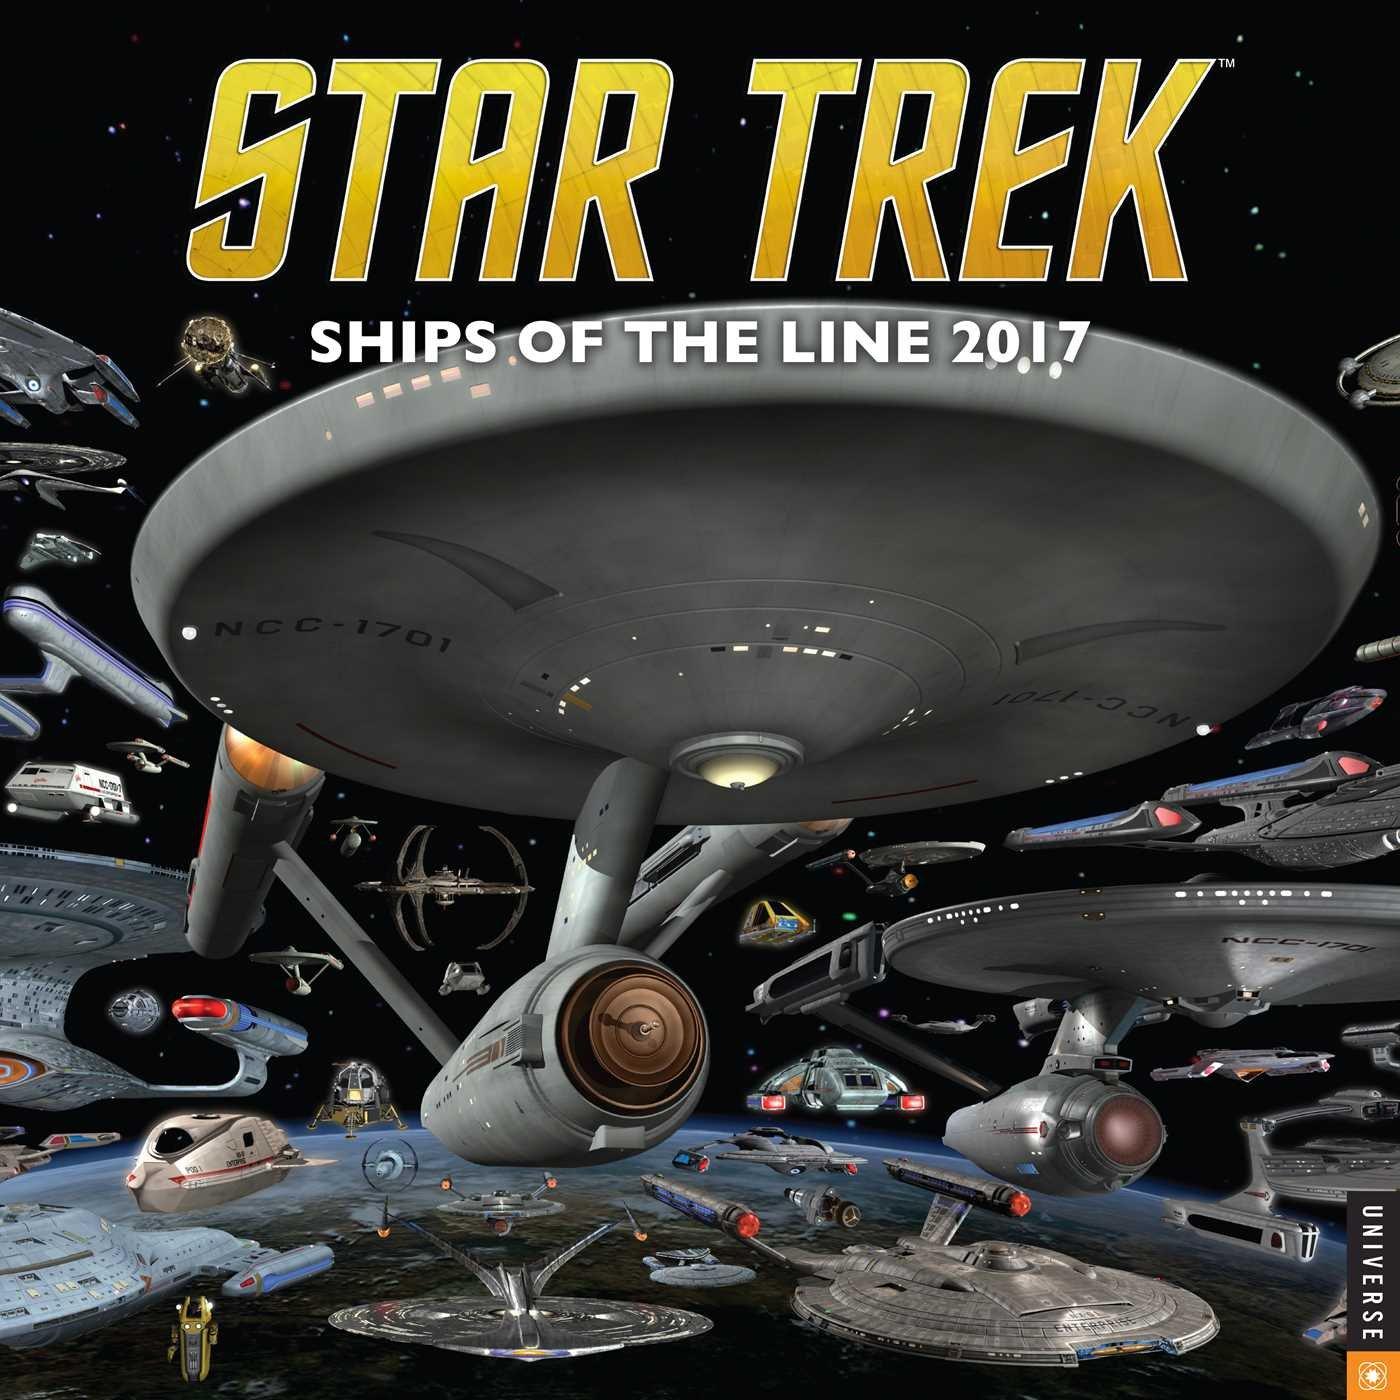 Star Trek 2017 Wall Calendar: Ships of the Line PDF